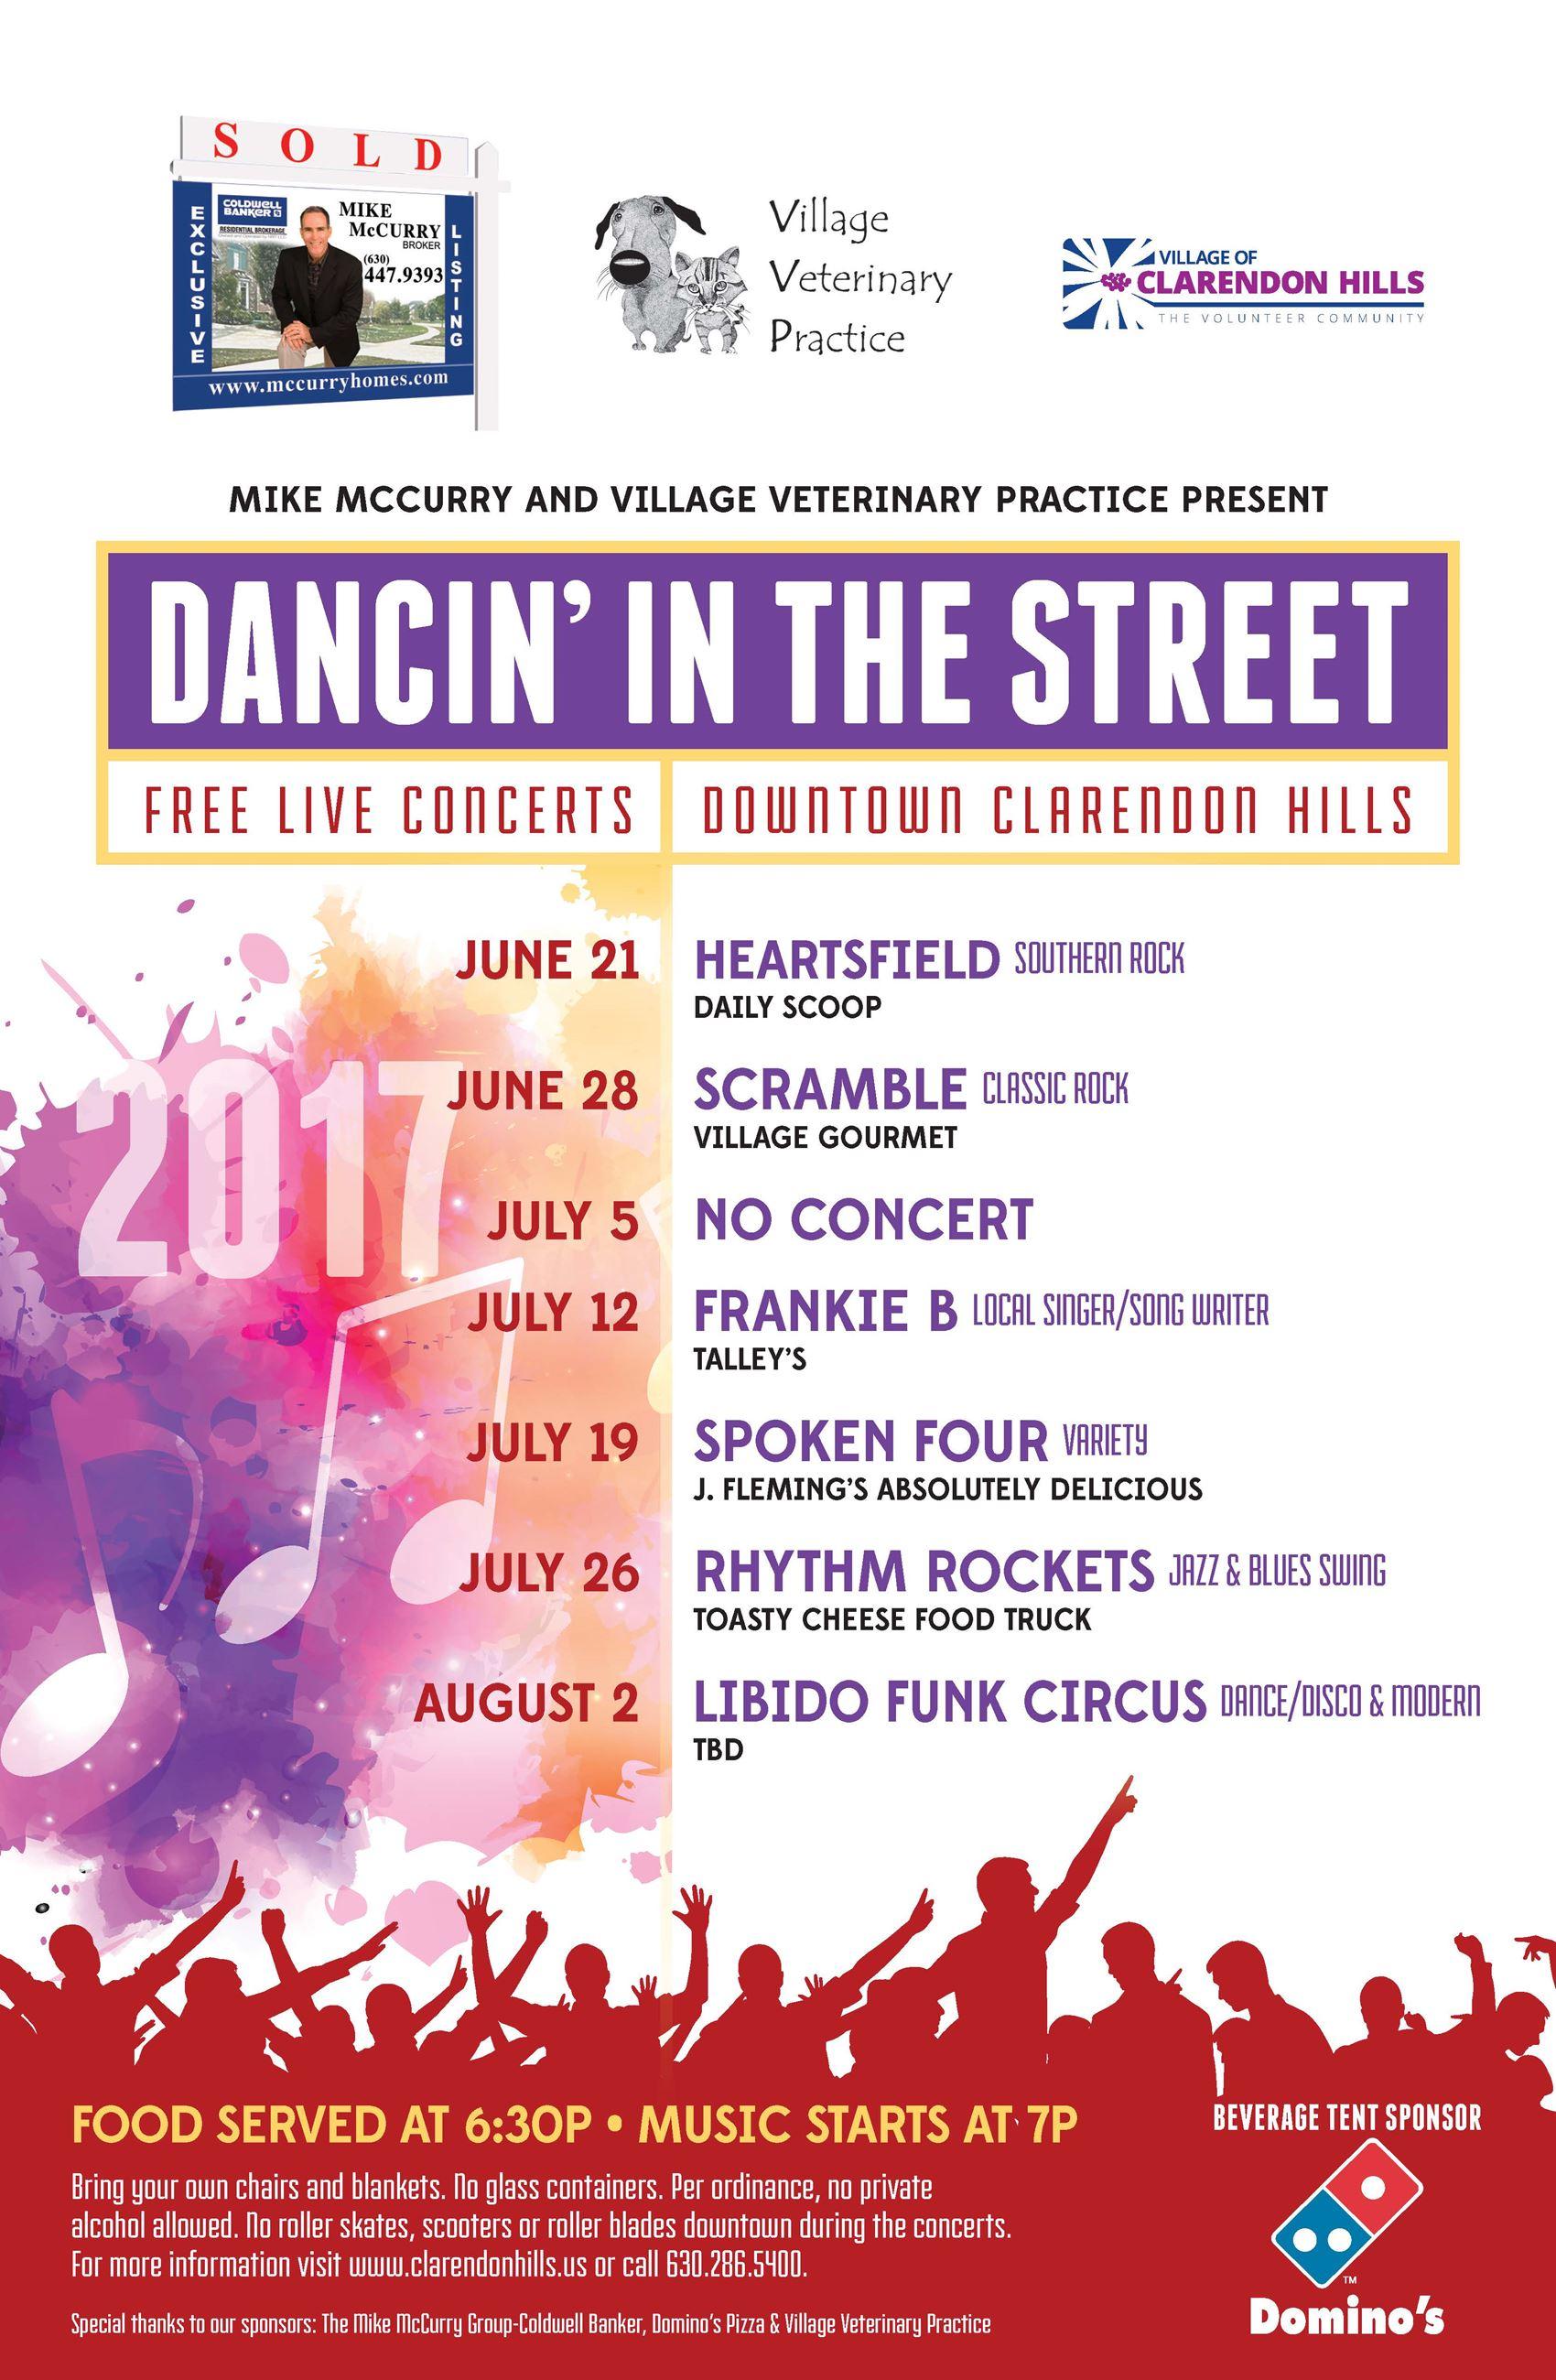 Clarendon Hills Dancin in the Street 2017 near West Suburban Funeral